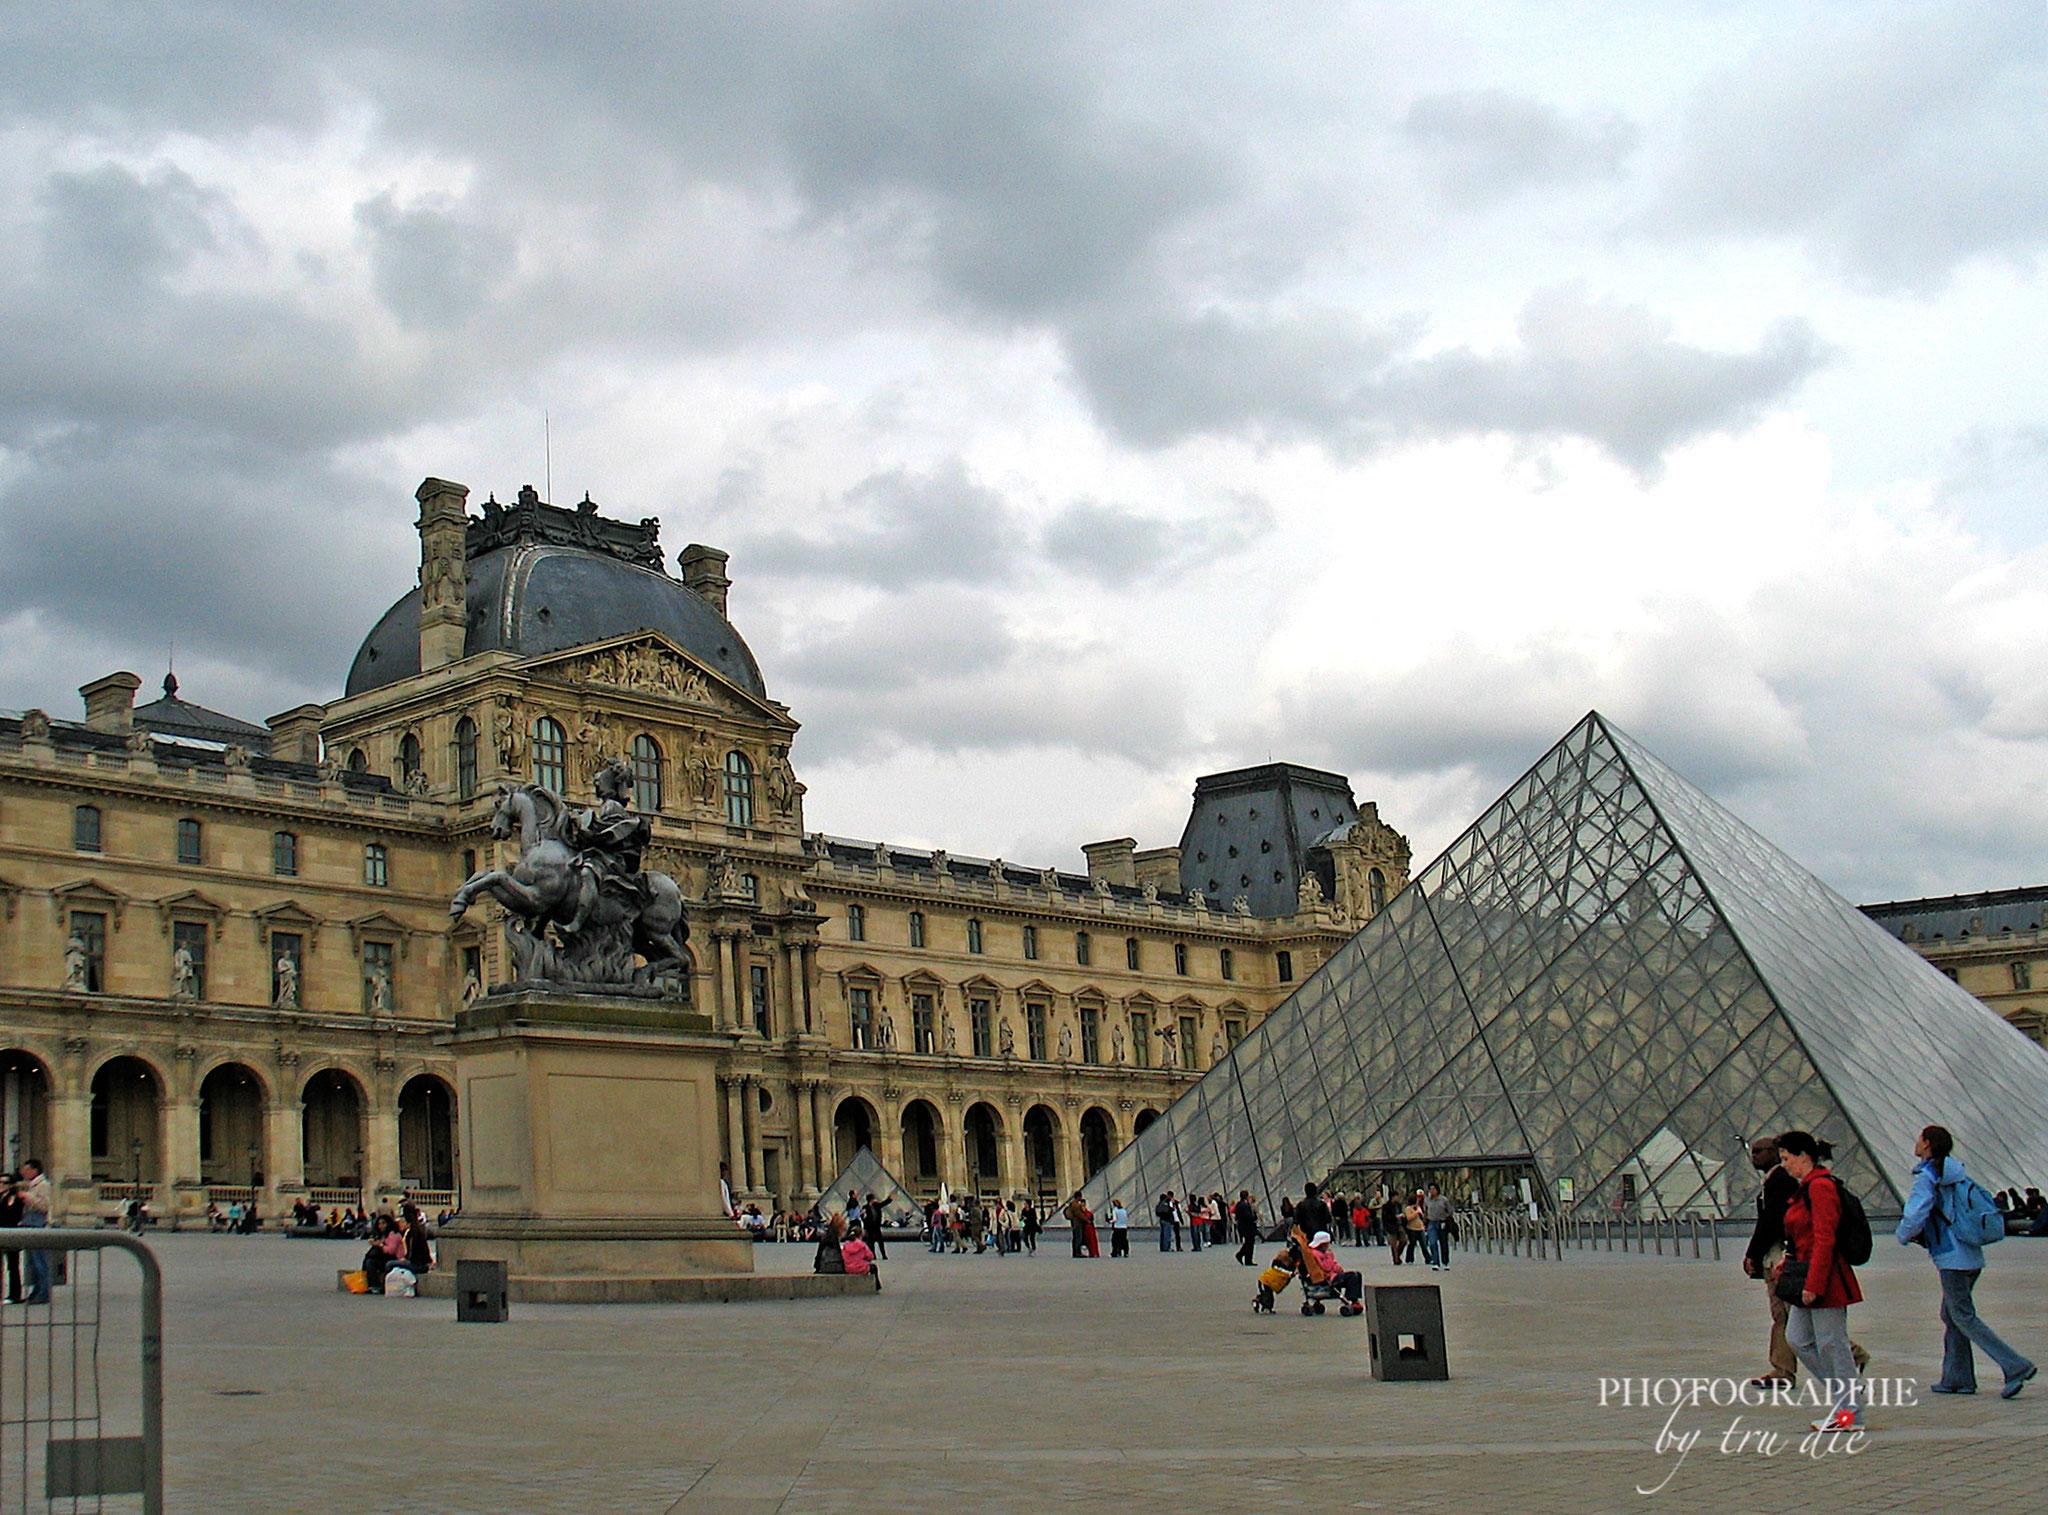 Bild: Louvre Paris mit Glaspyramide